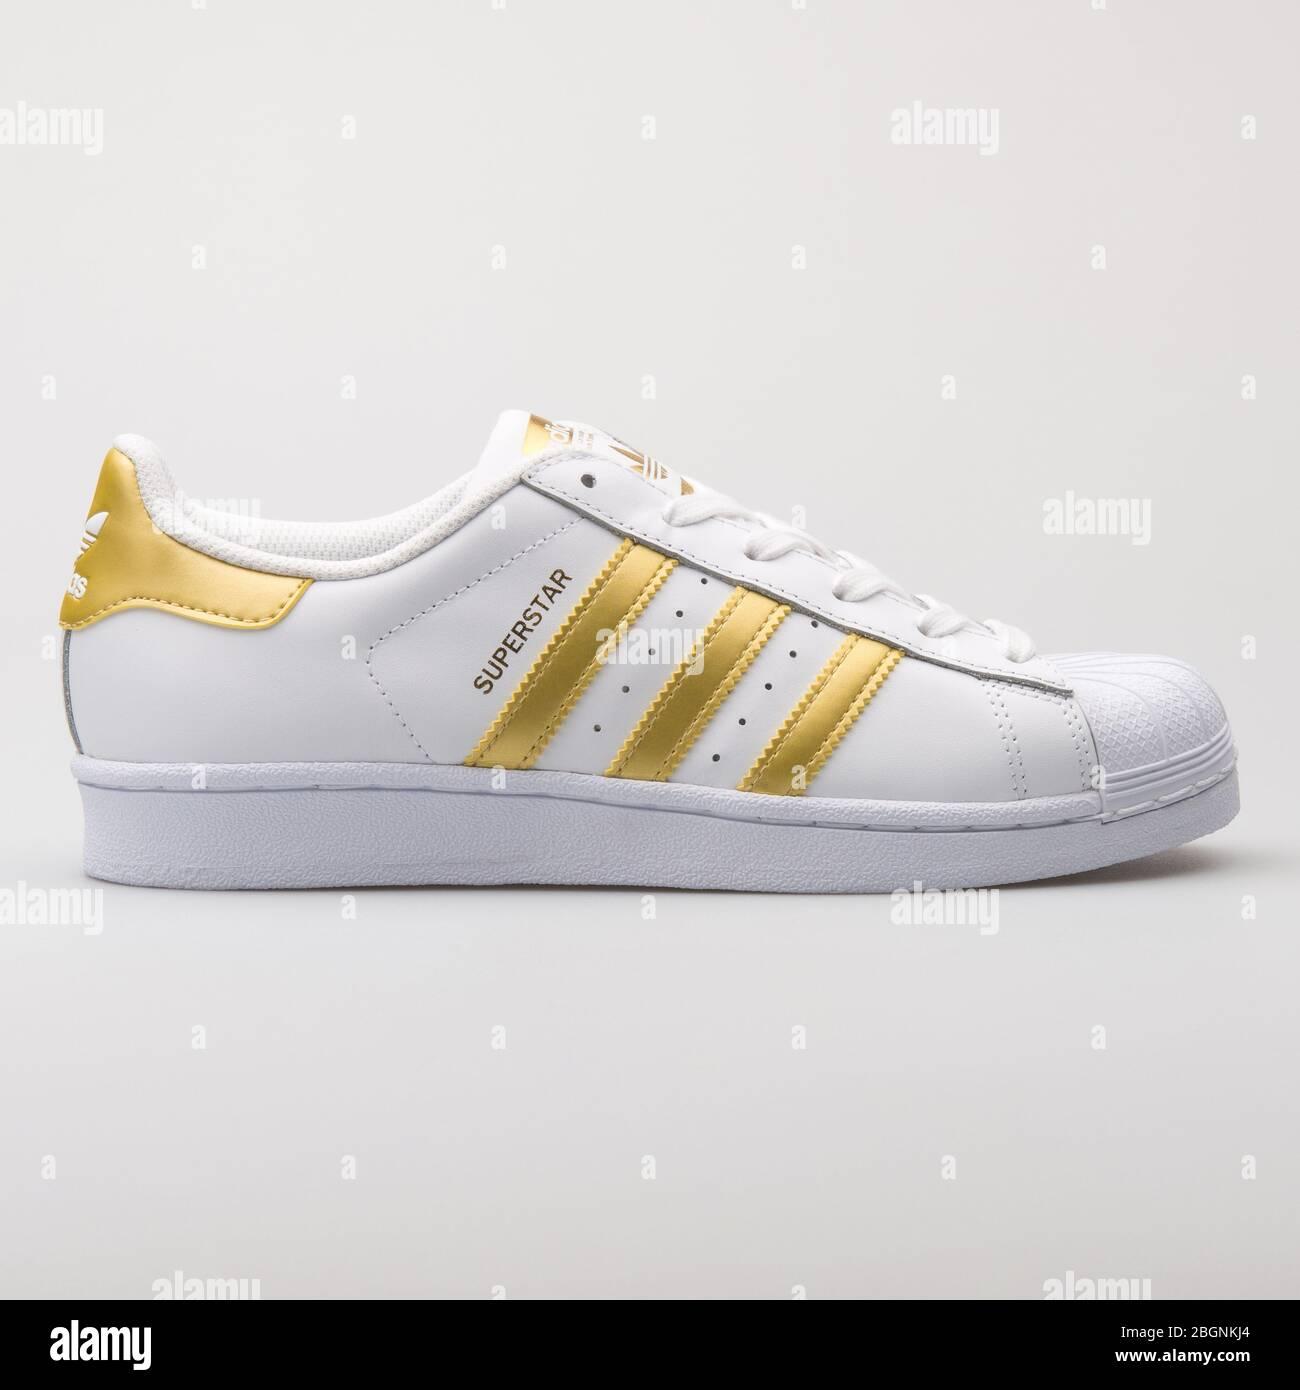 adidas superstar bianco giallo